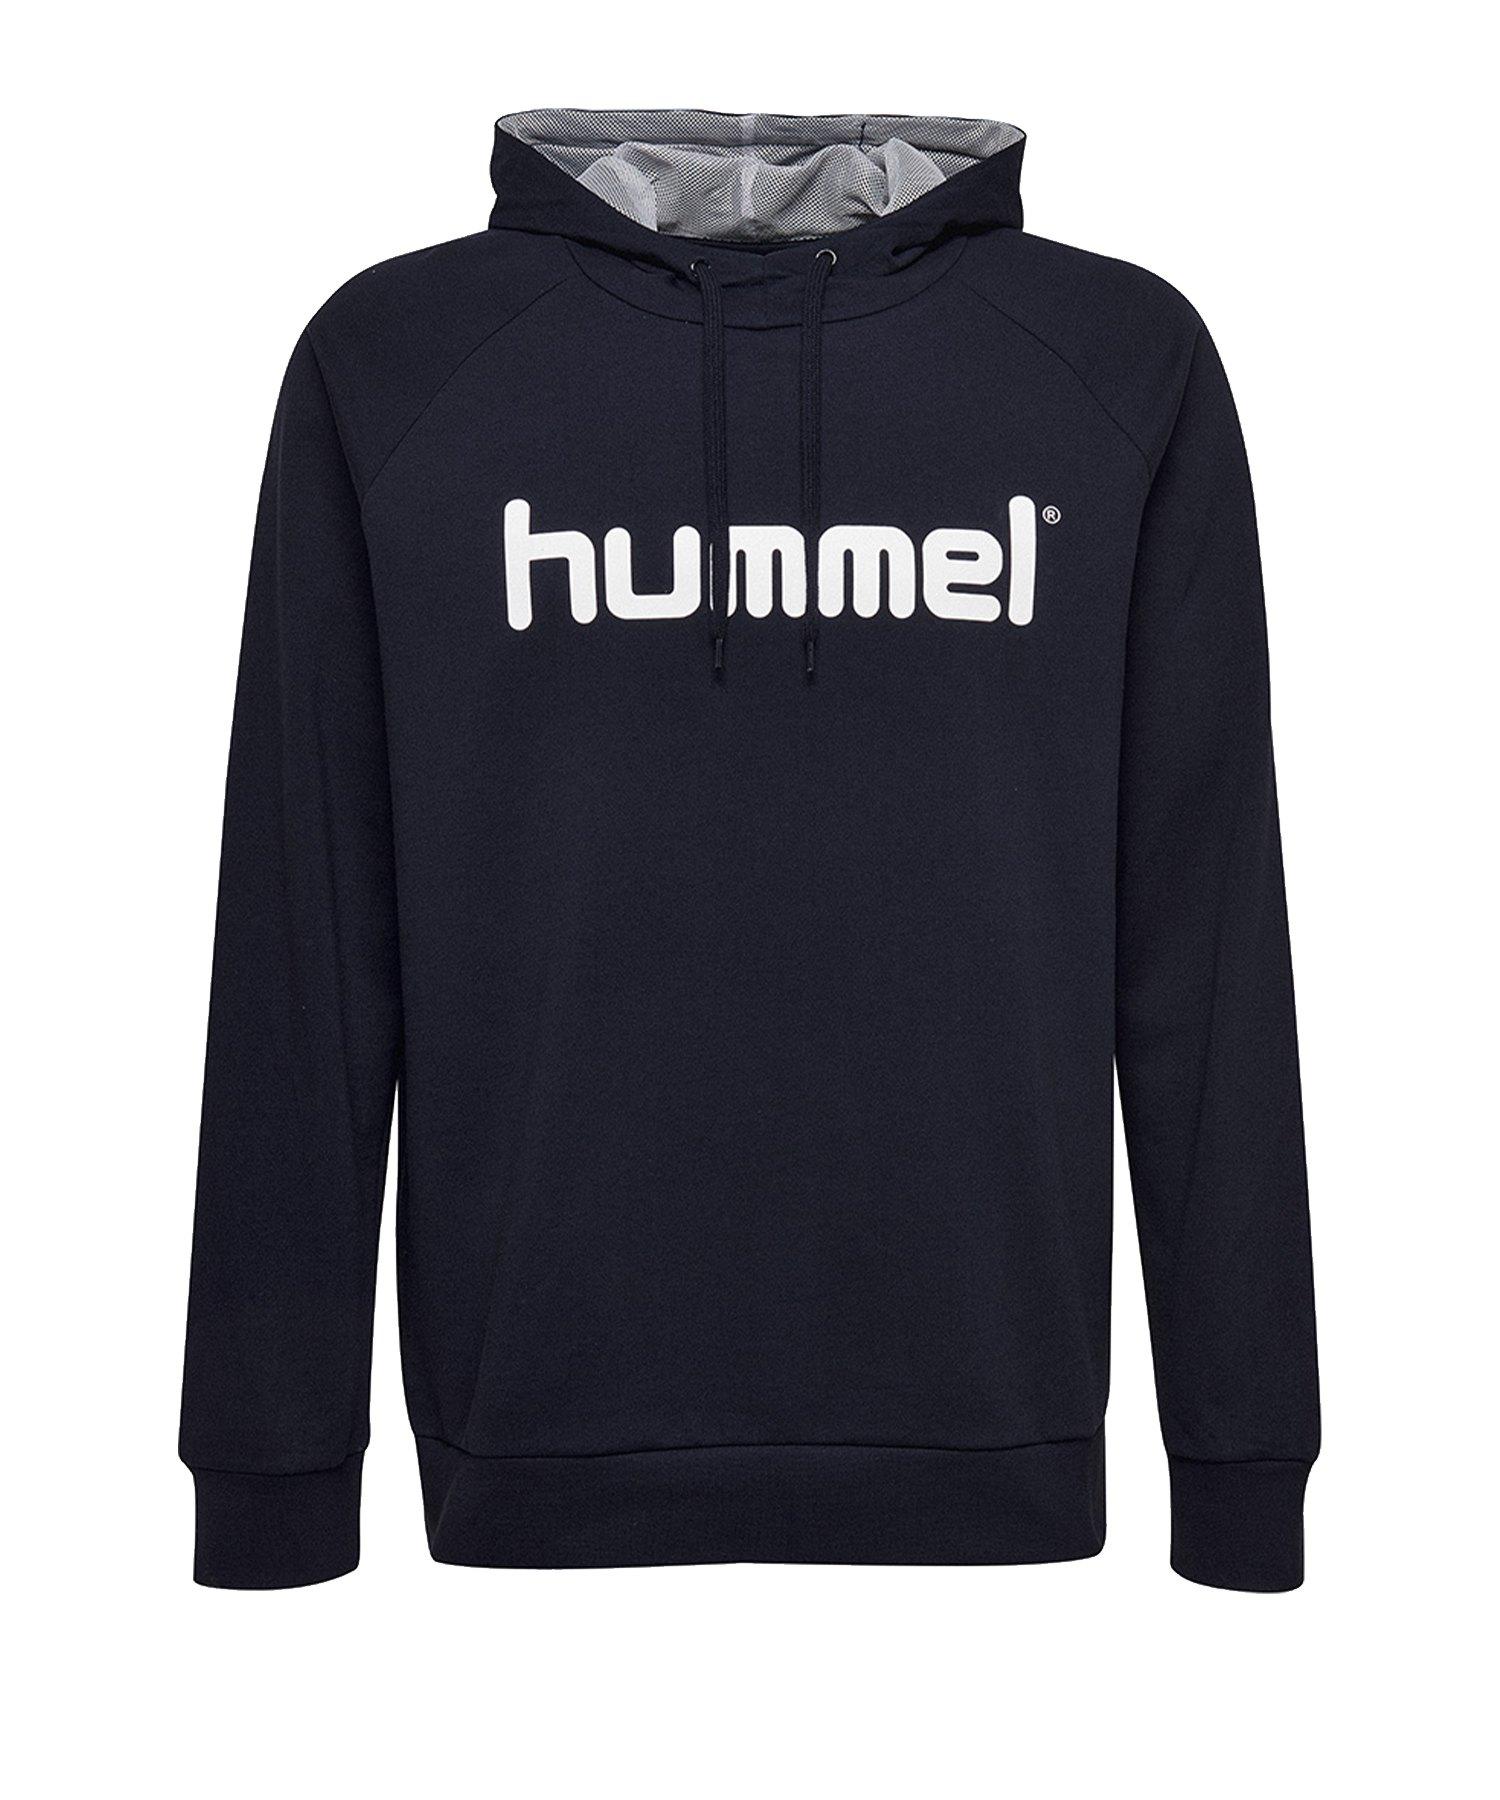 Hummel Cotton Logo Hoody Kids Blau F7026 - Blau